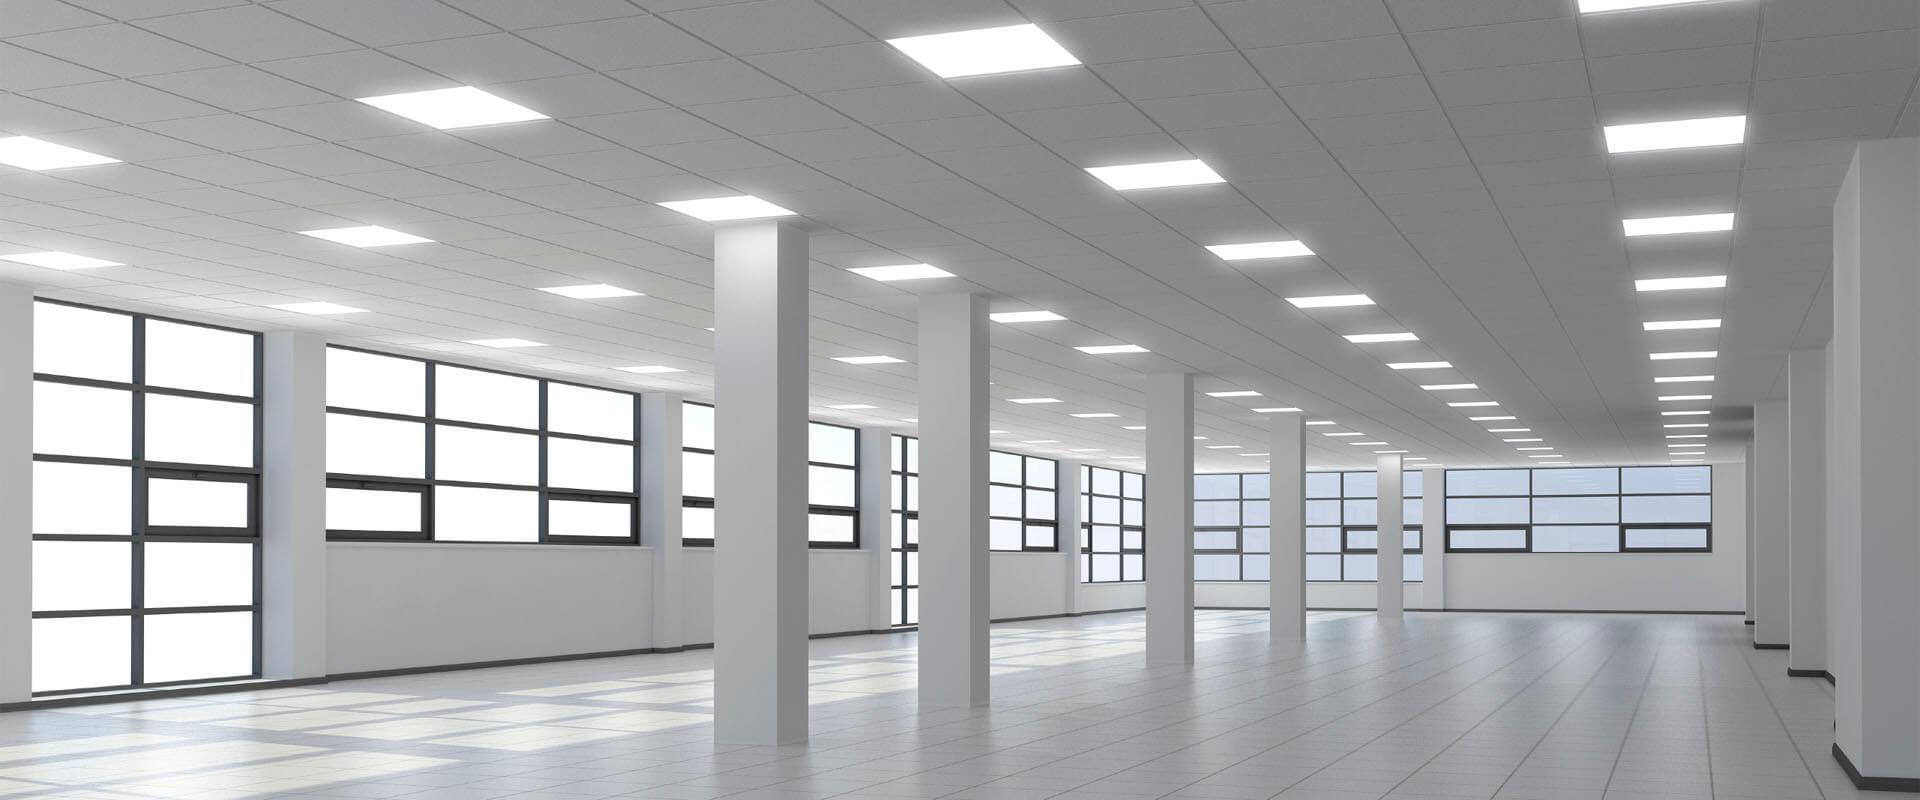 10 Reasons To Choose Led Lighting